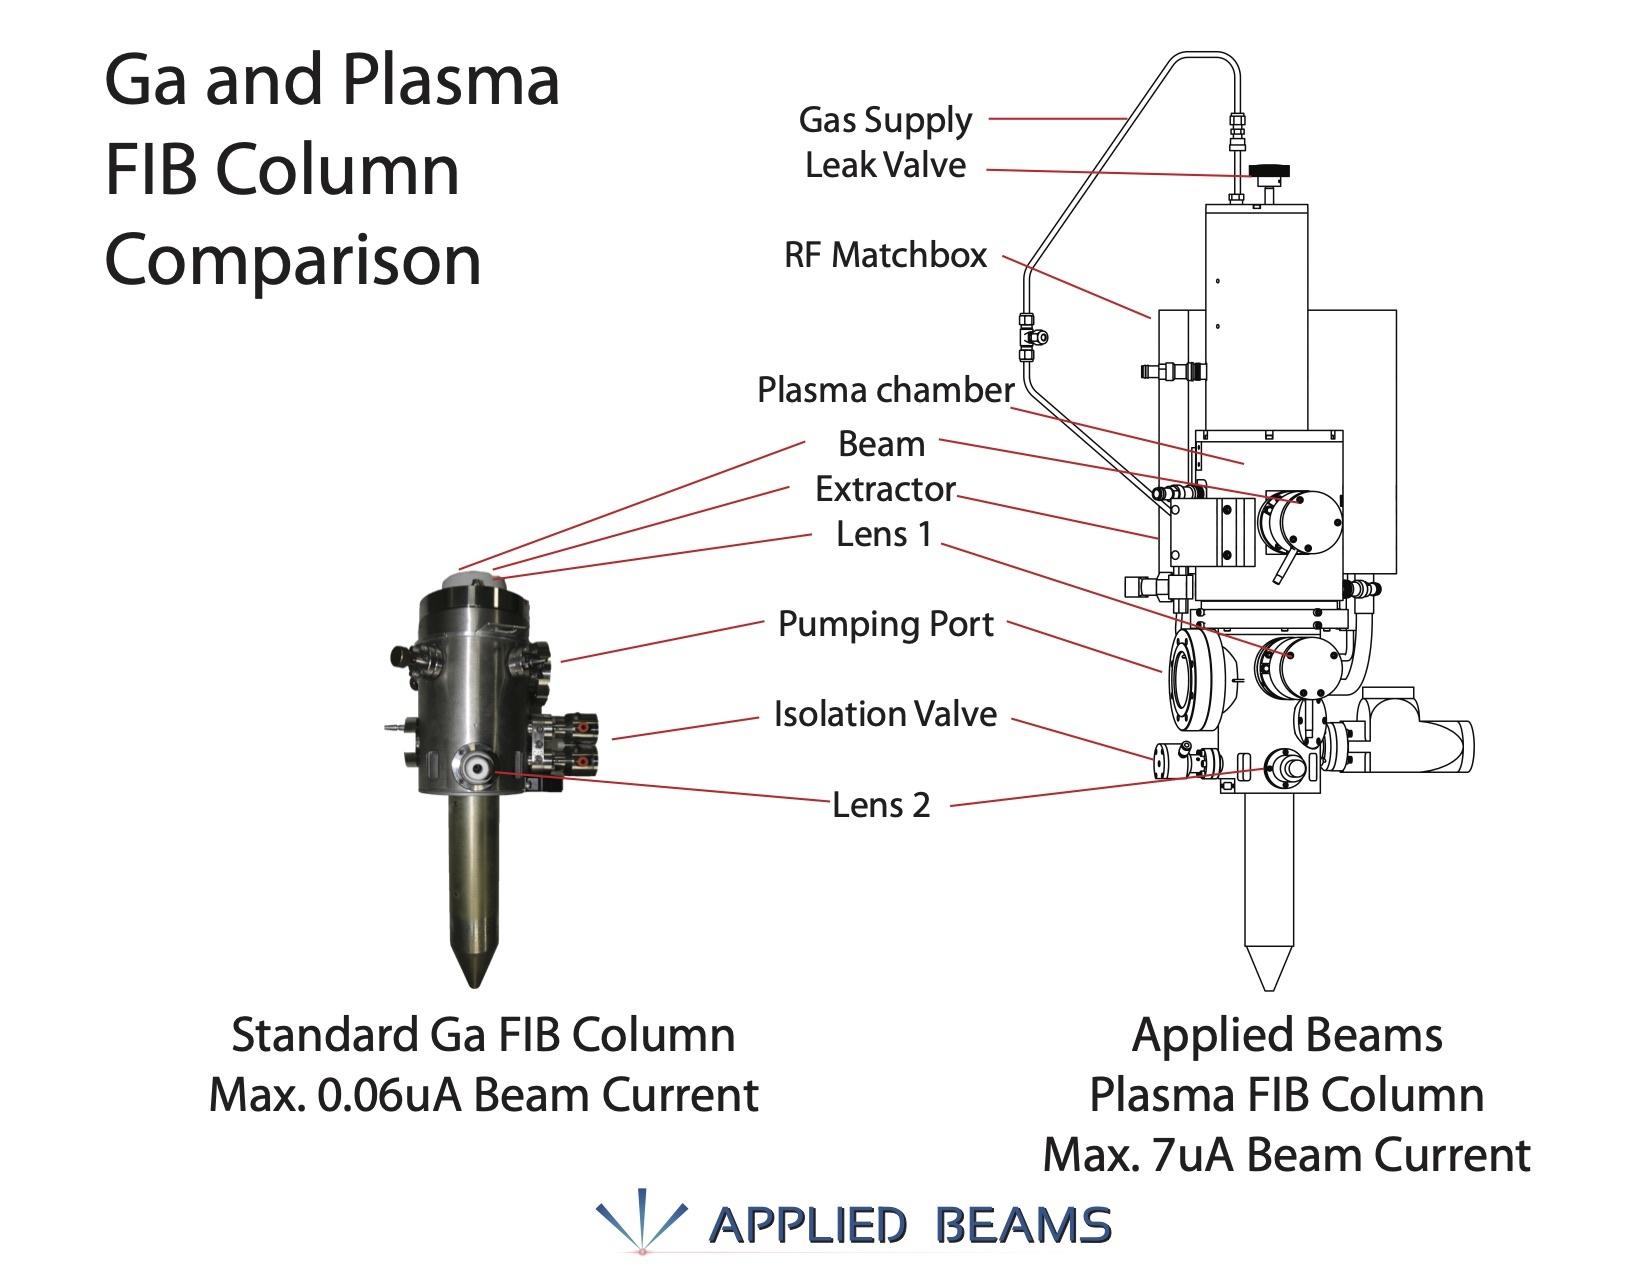 Graphical comparison between a standard Ga FIB column and the Applied Beams HyperFIB Plasma FIB upgrade